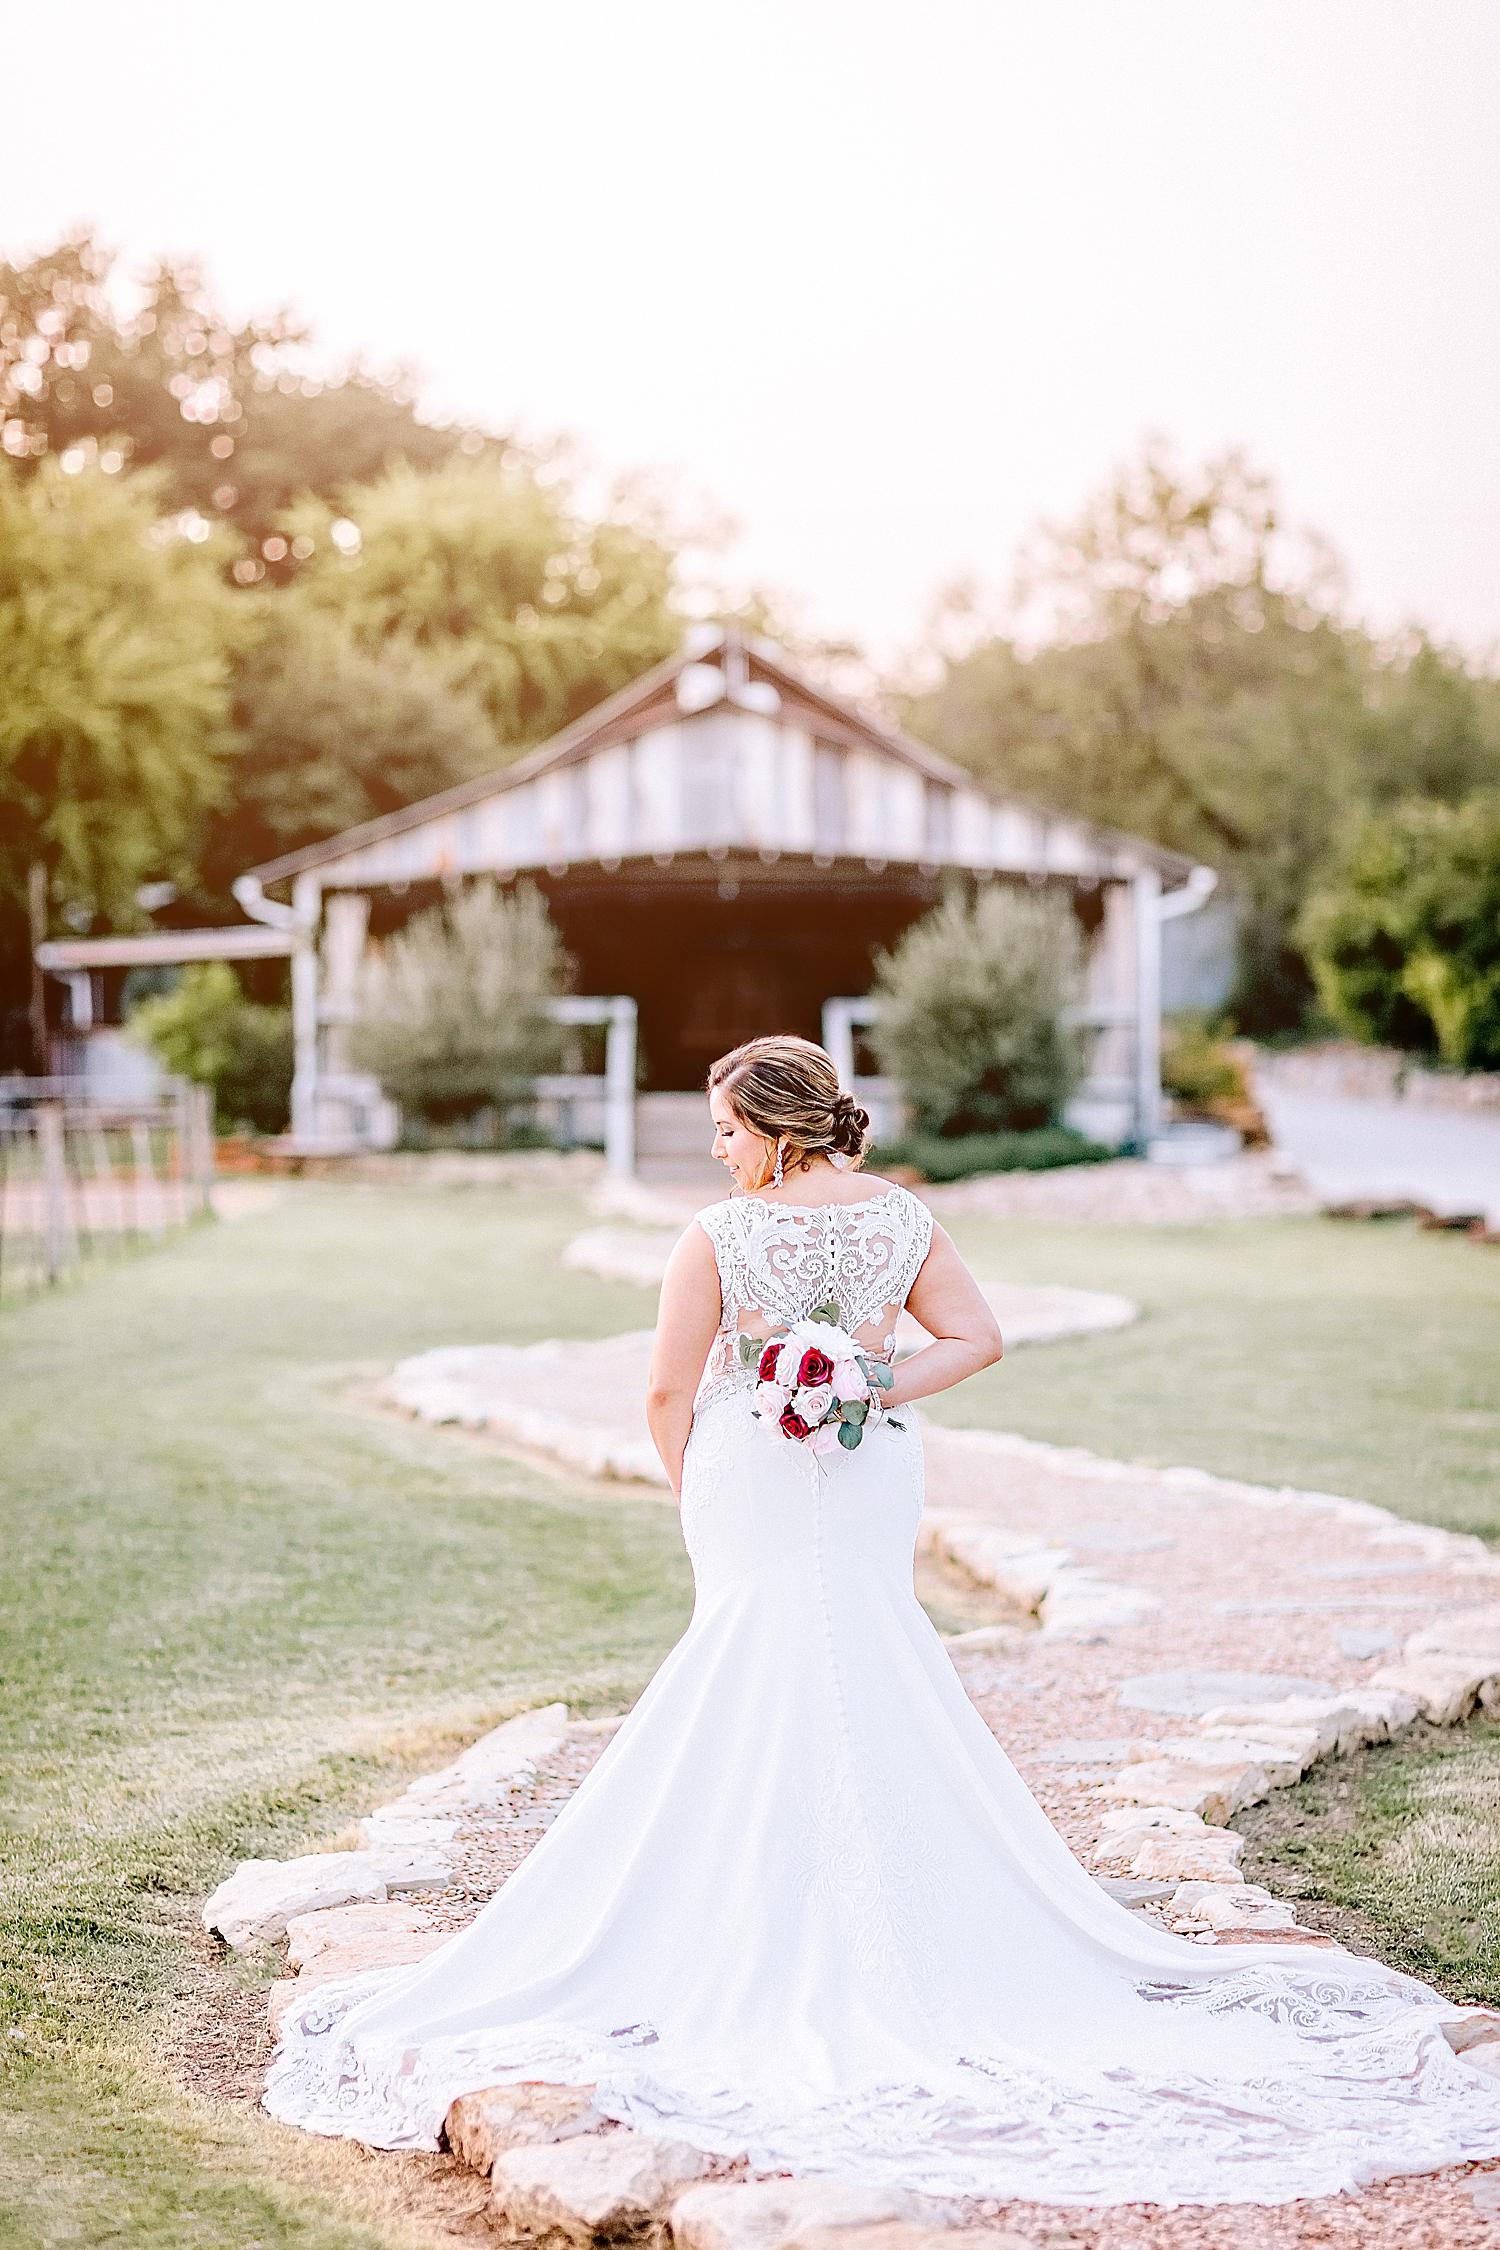 Carly-Barton-Photography-Gruene-Estate-Wedding-Photographer-New-Braunfels-Texas-Bridal-Session_0024.jpg